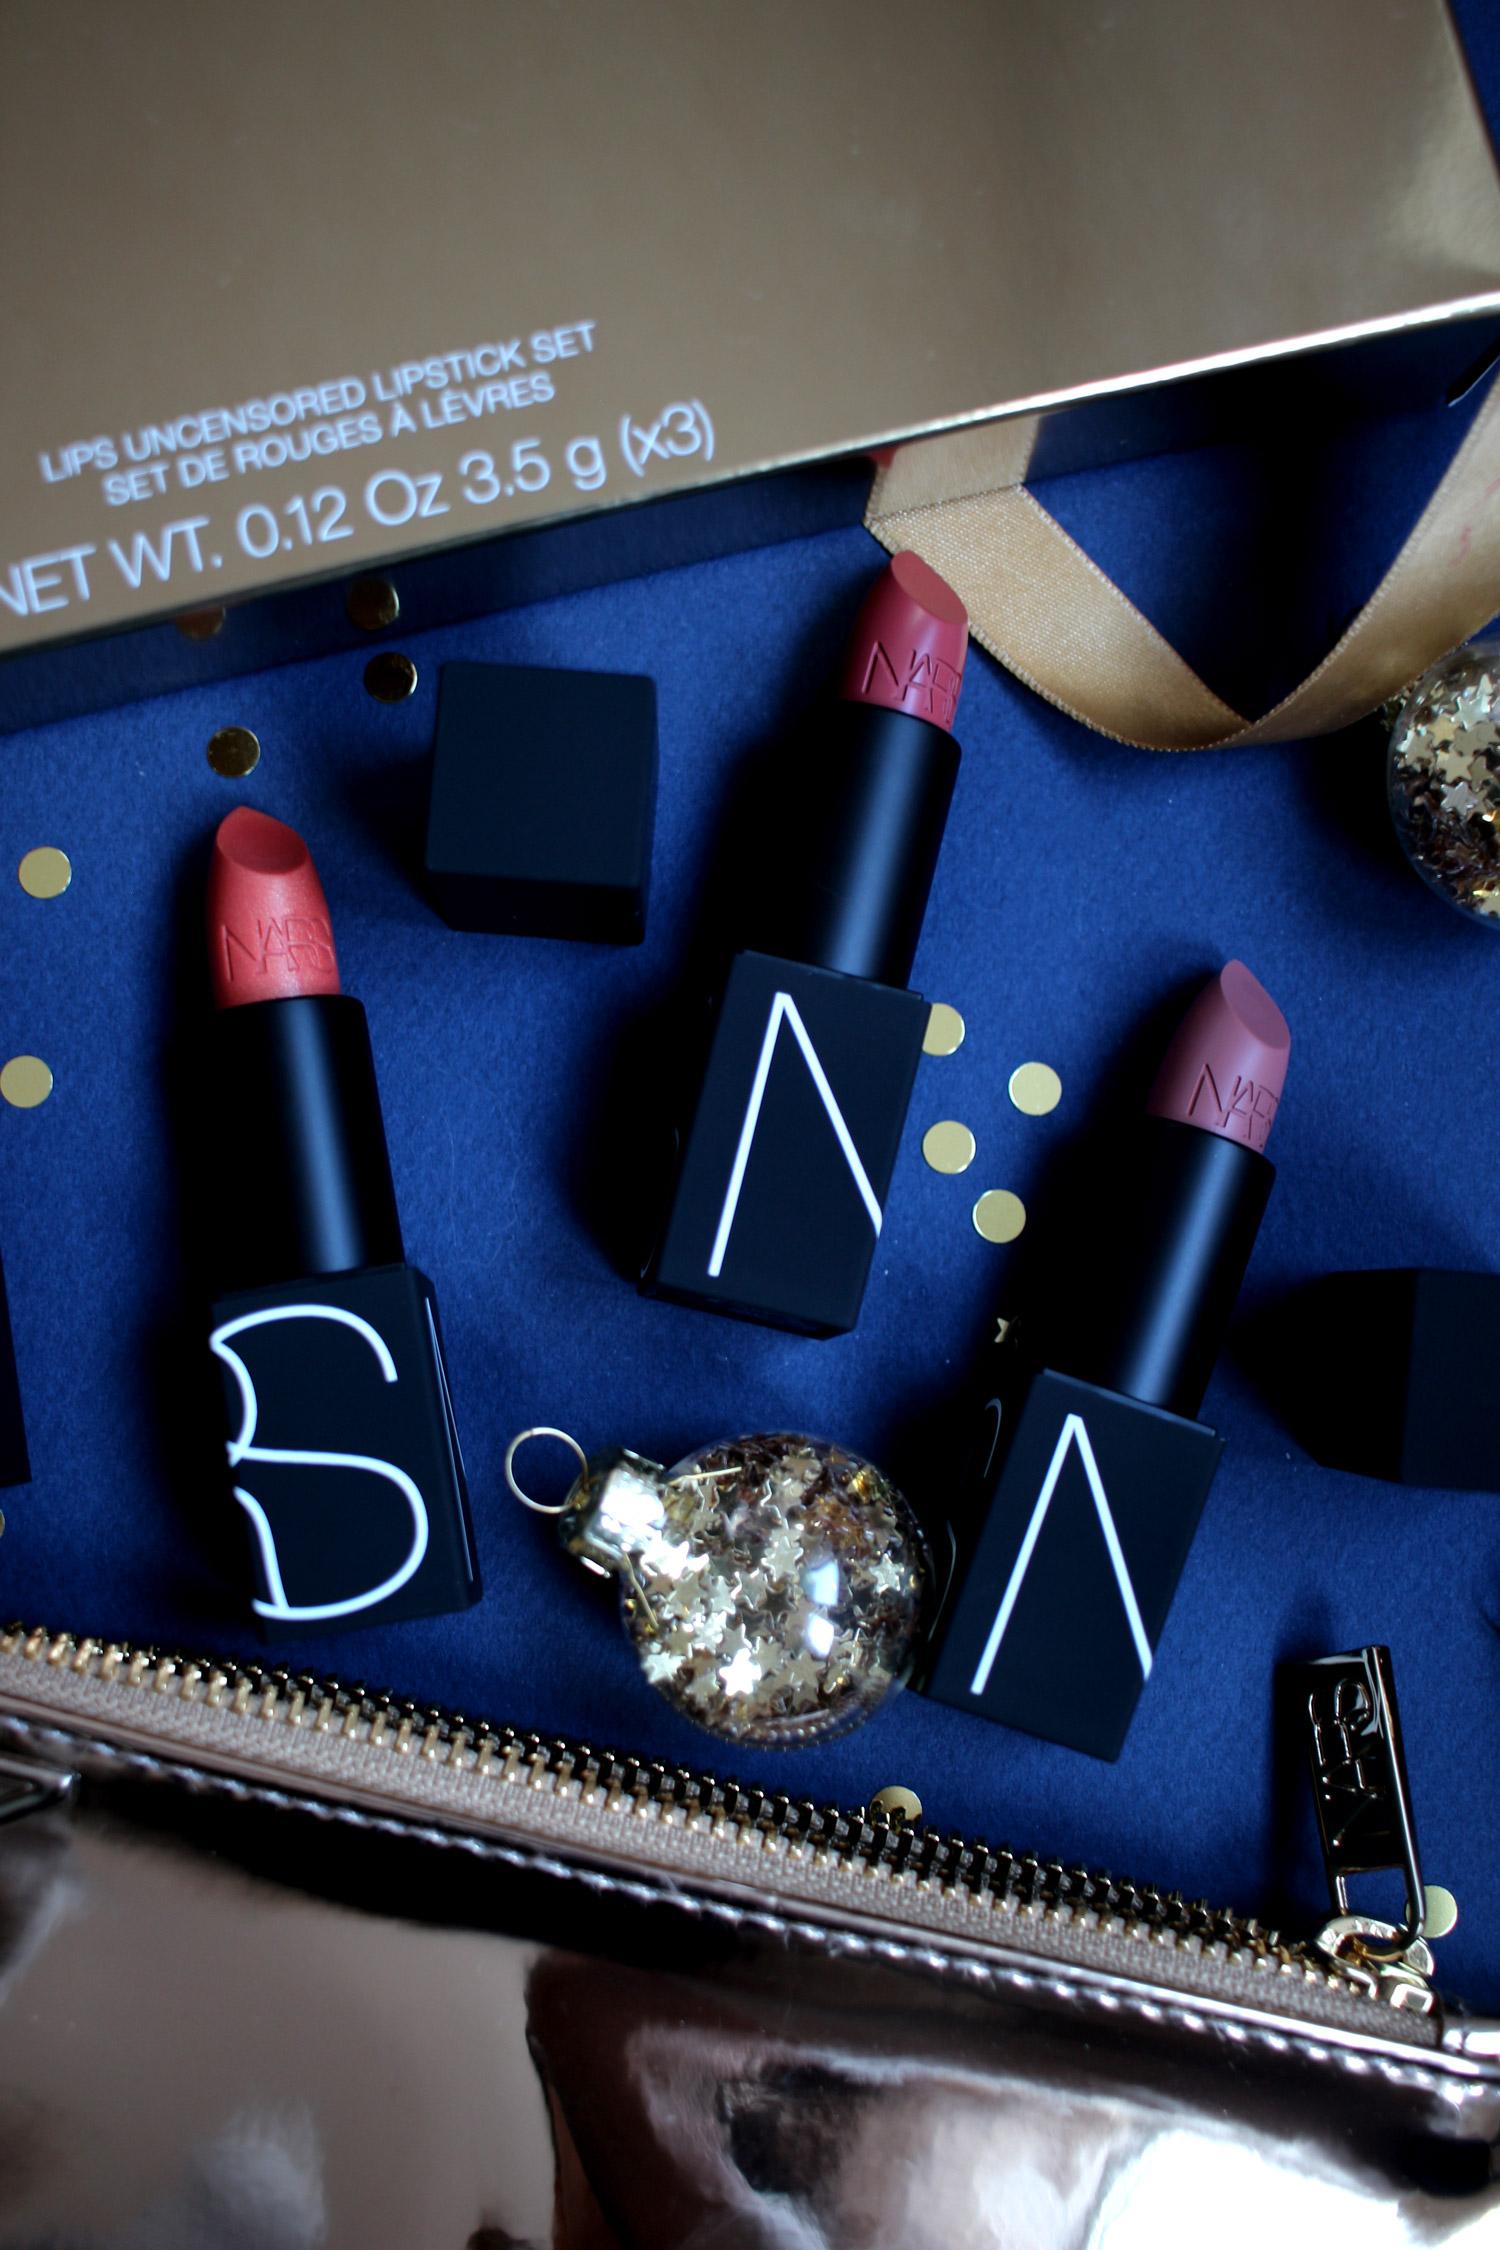 christmas-2020-beauty-gift-guide-NARS-gift-sets-gold-lips-uncensored-set-1